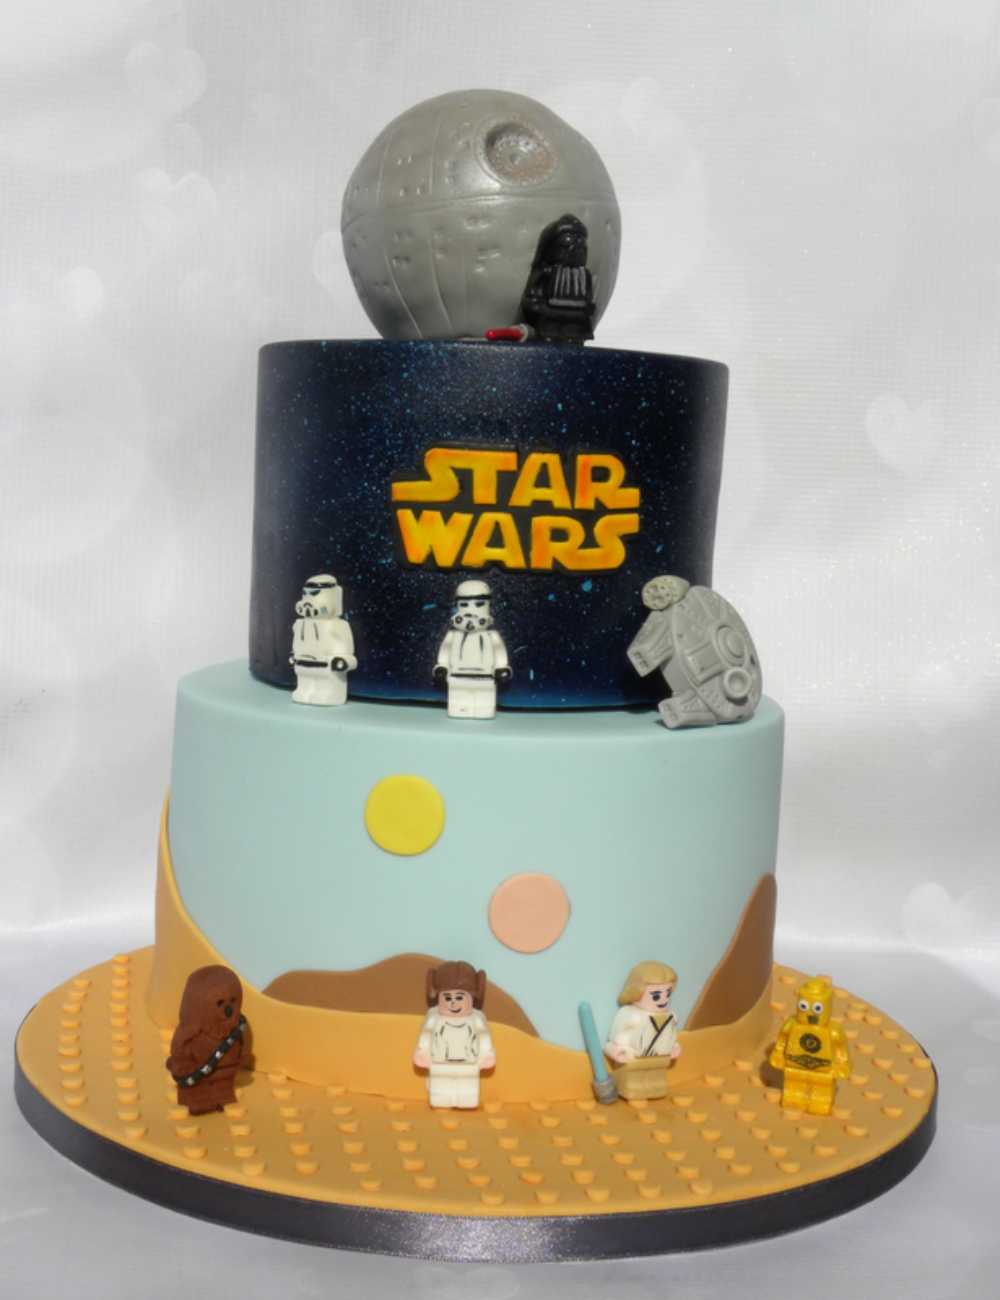 Star_Wars_Lego_cake